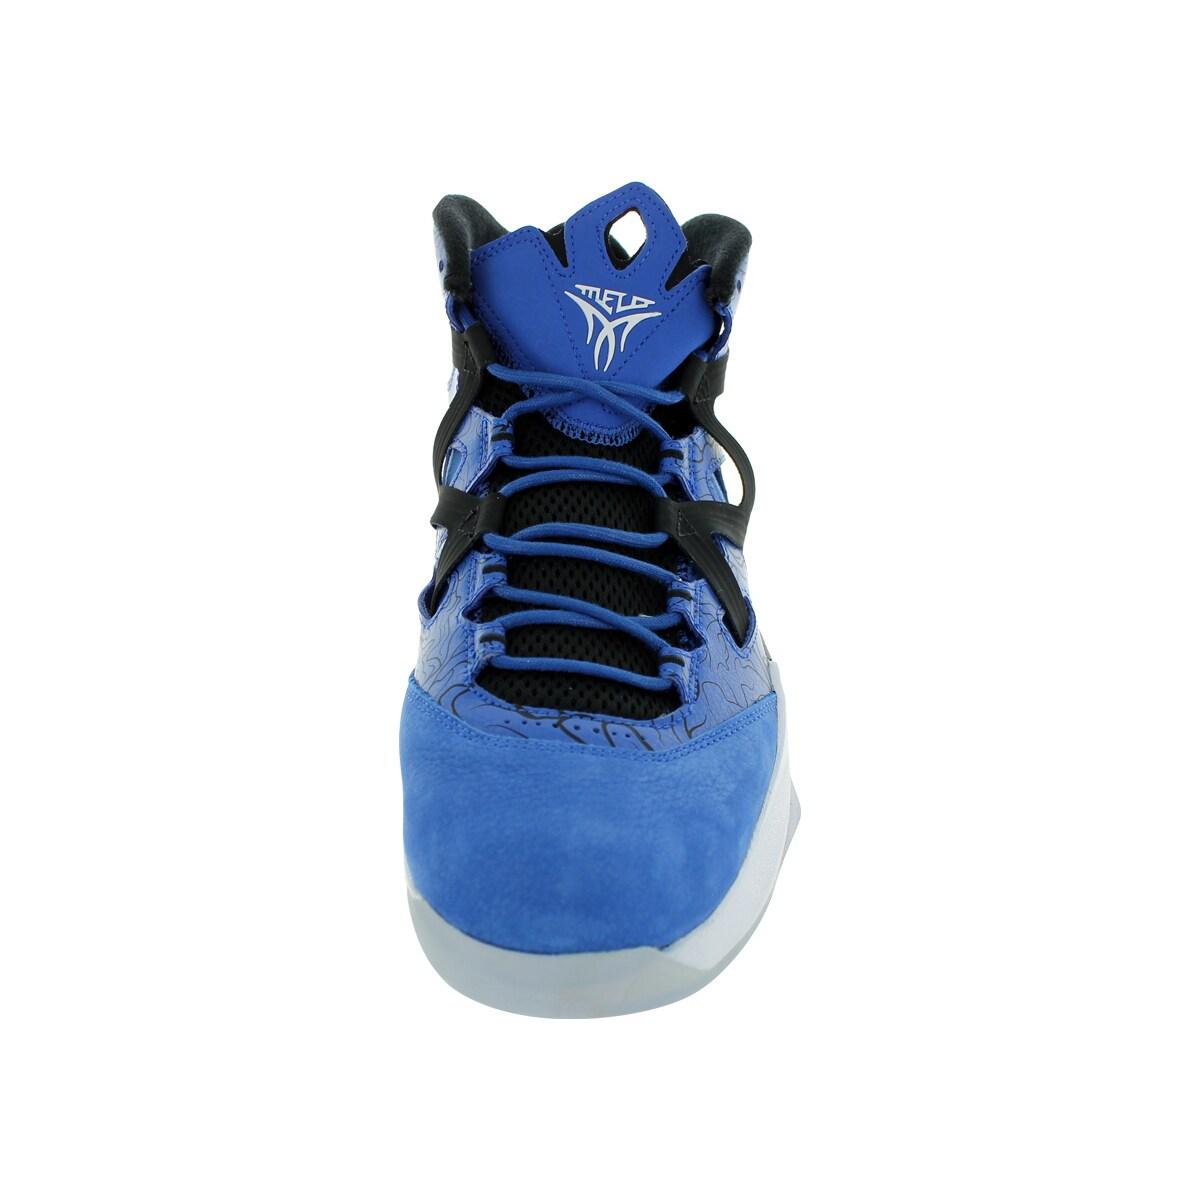 low priced 40e7b 4f633 Shop Nike Men s Jordan Melo M9 Game Royal White Black Basketball Shoe -  Free Shipping Today - Overstock - 12318762